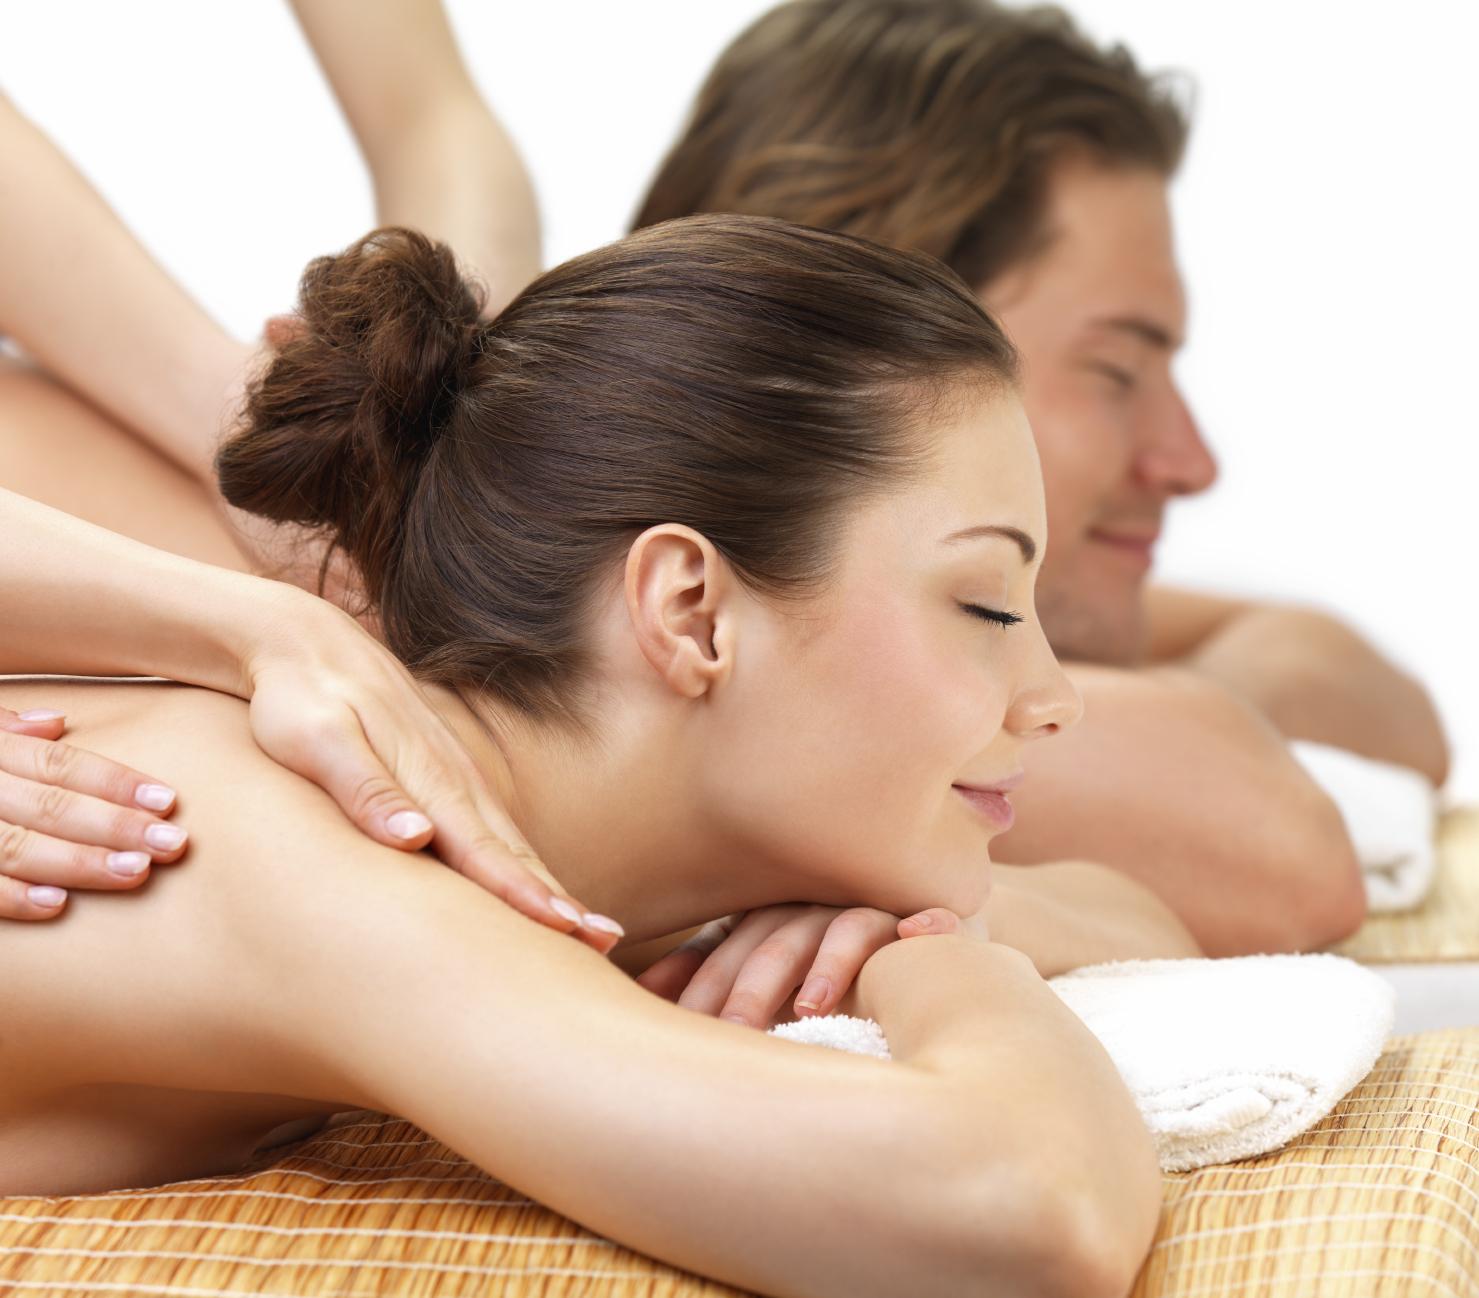 Тантрический массаж мужчине онлайн 14 фотография